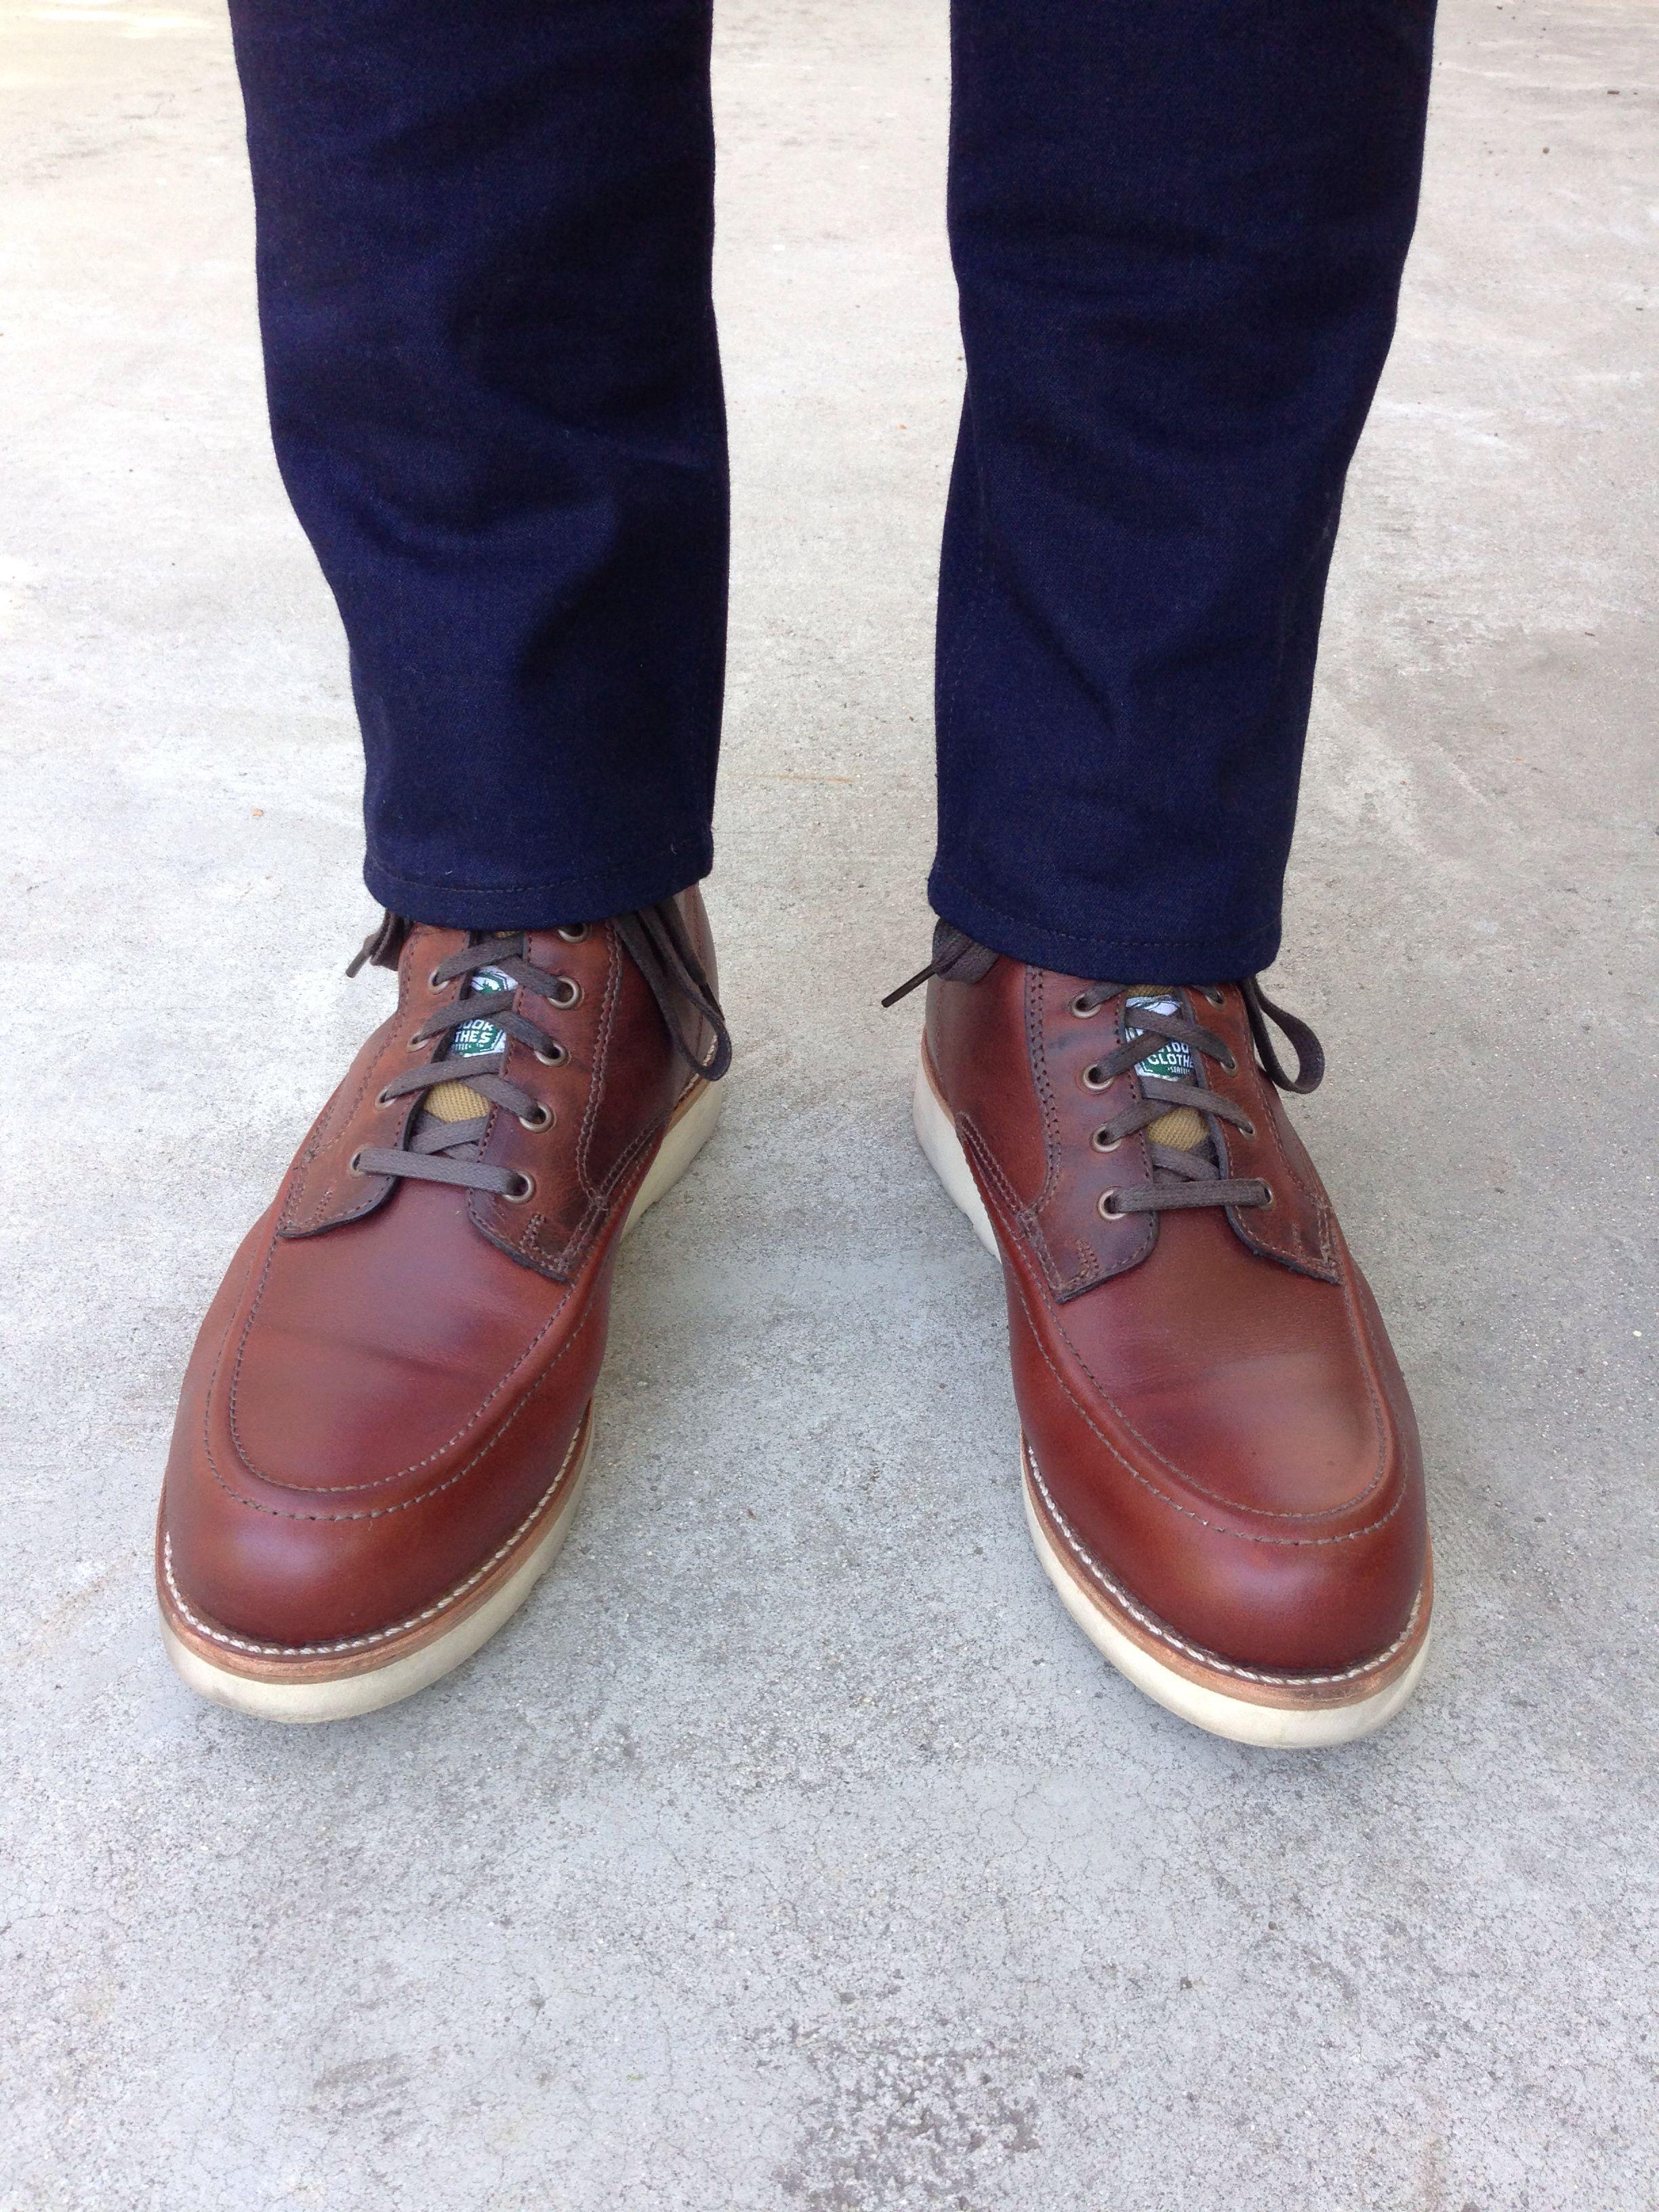 37c5017bf4b wolverine 1000 mile emerson filson boots menswear mensstyle ...